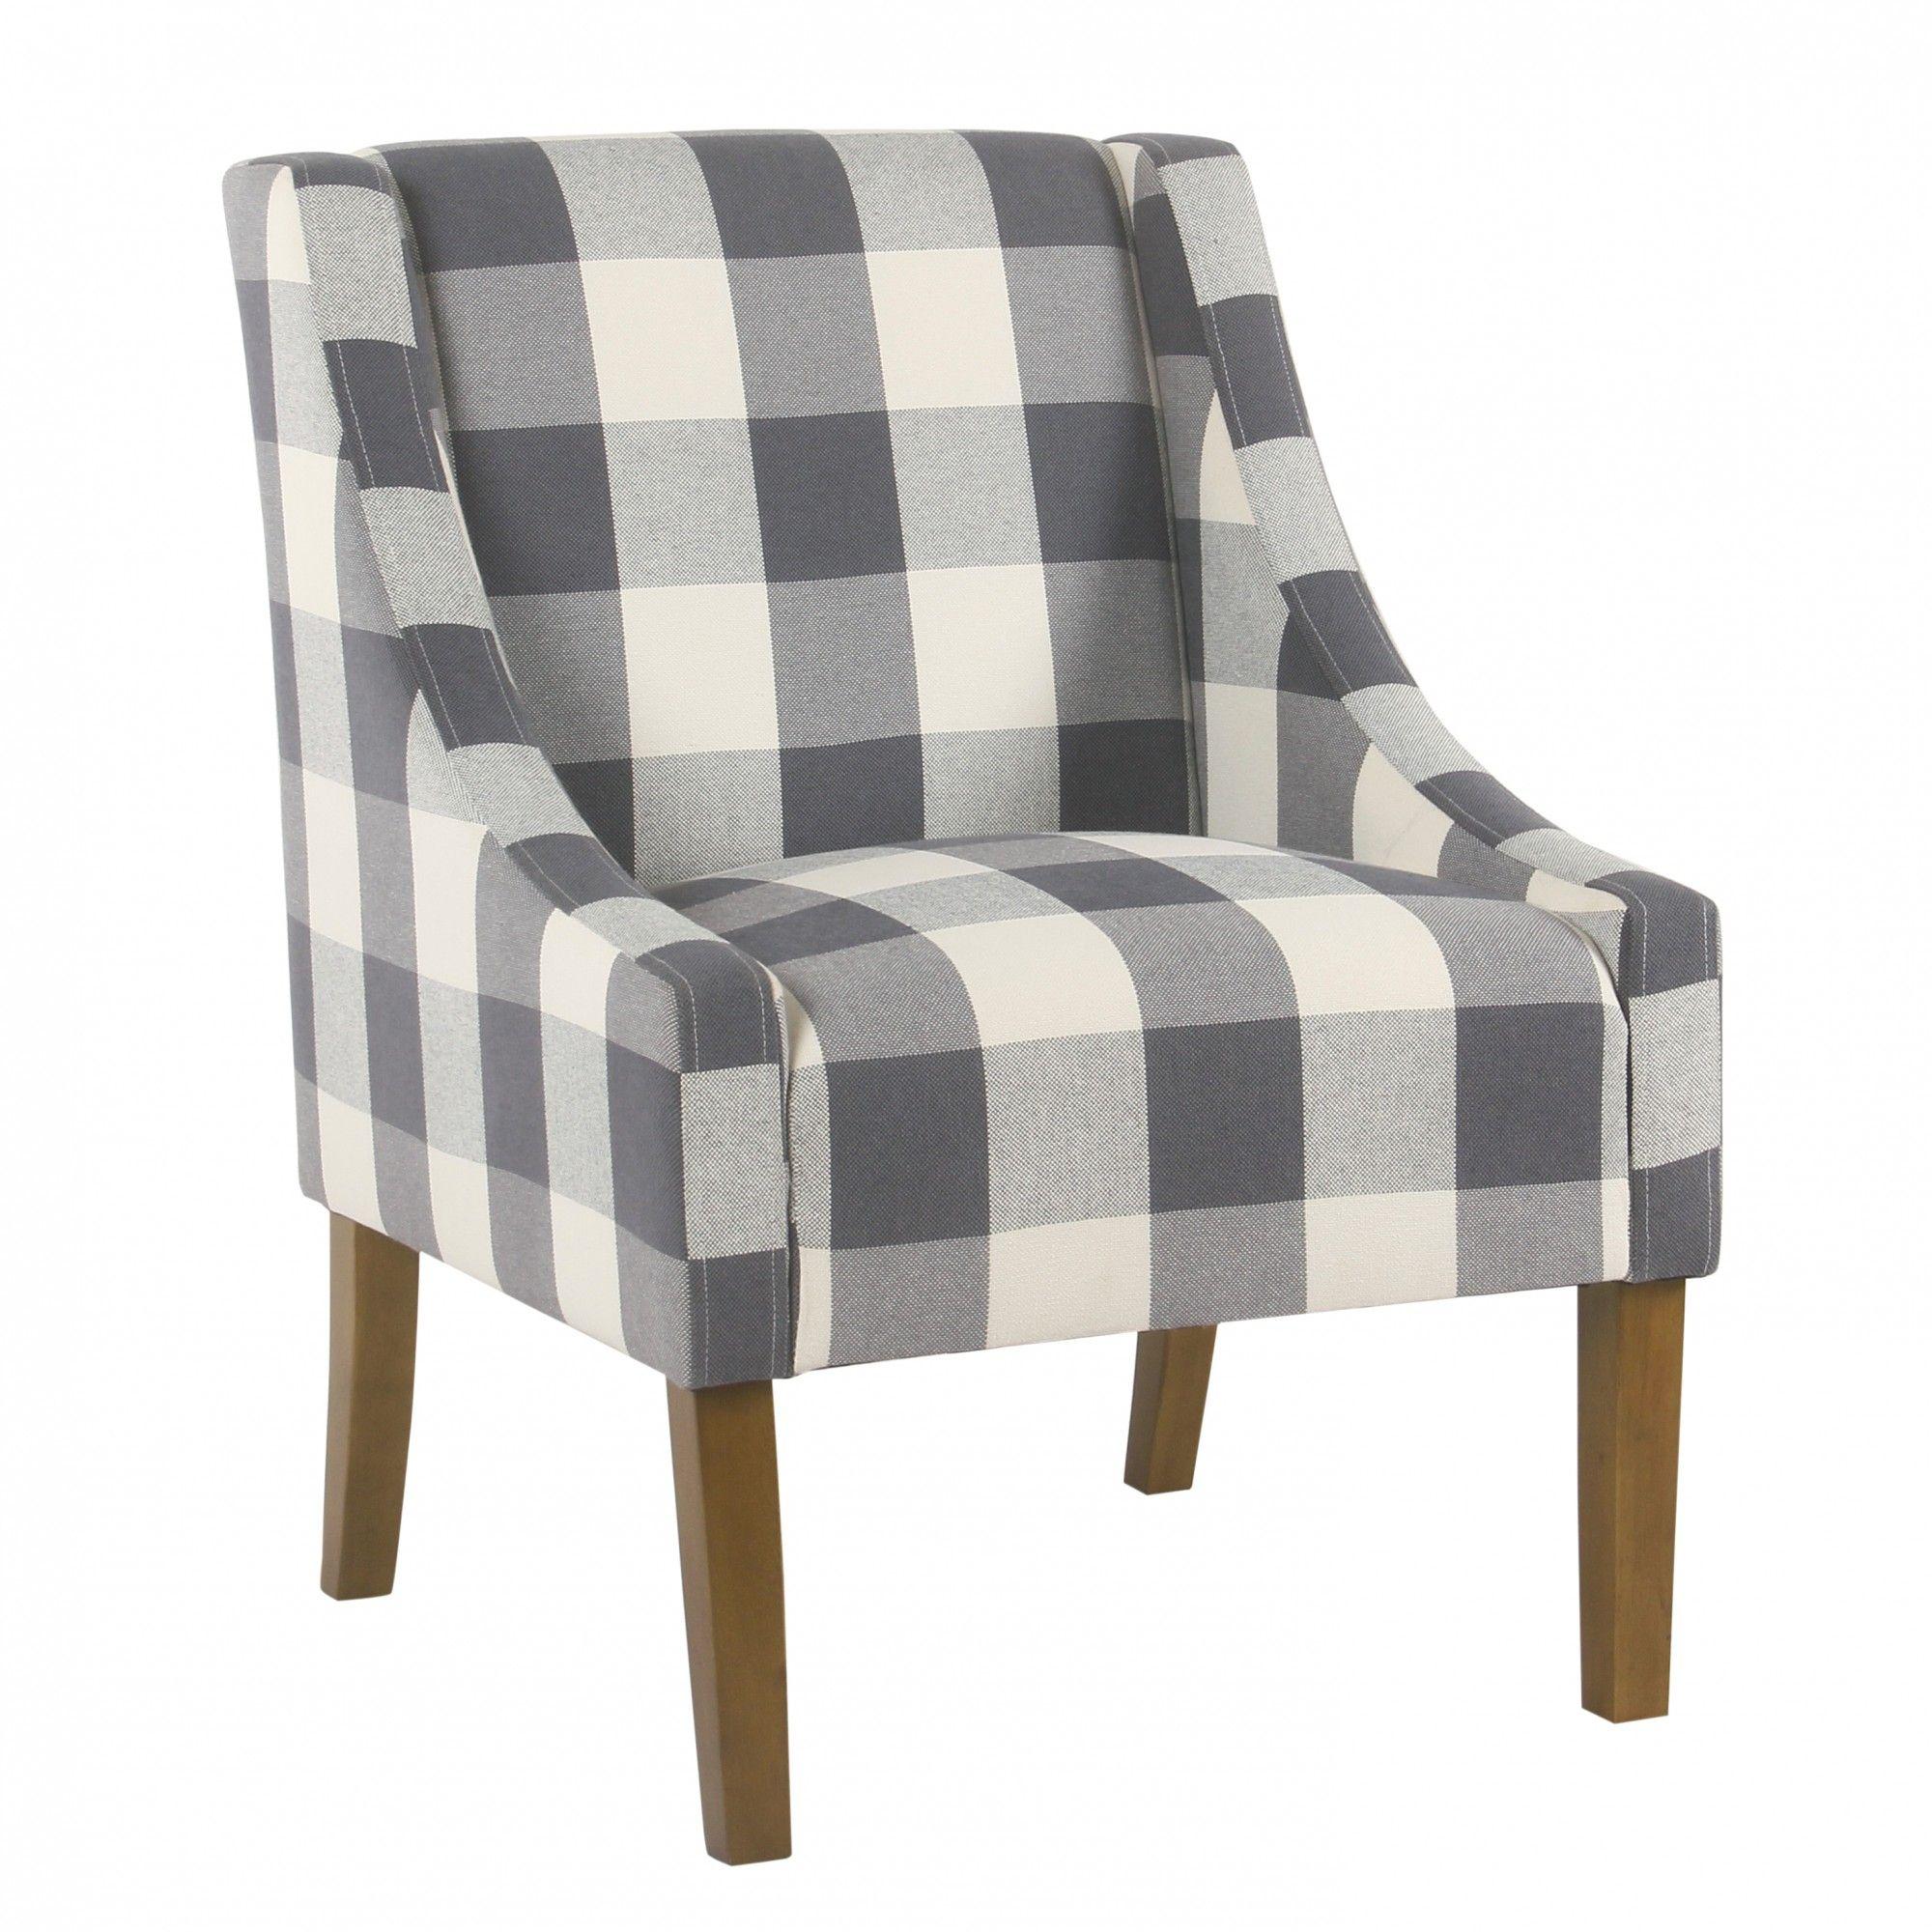 Modern Swoop Accent Chair   Blue Plaid